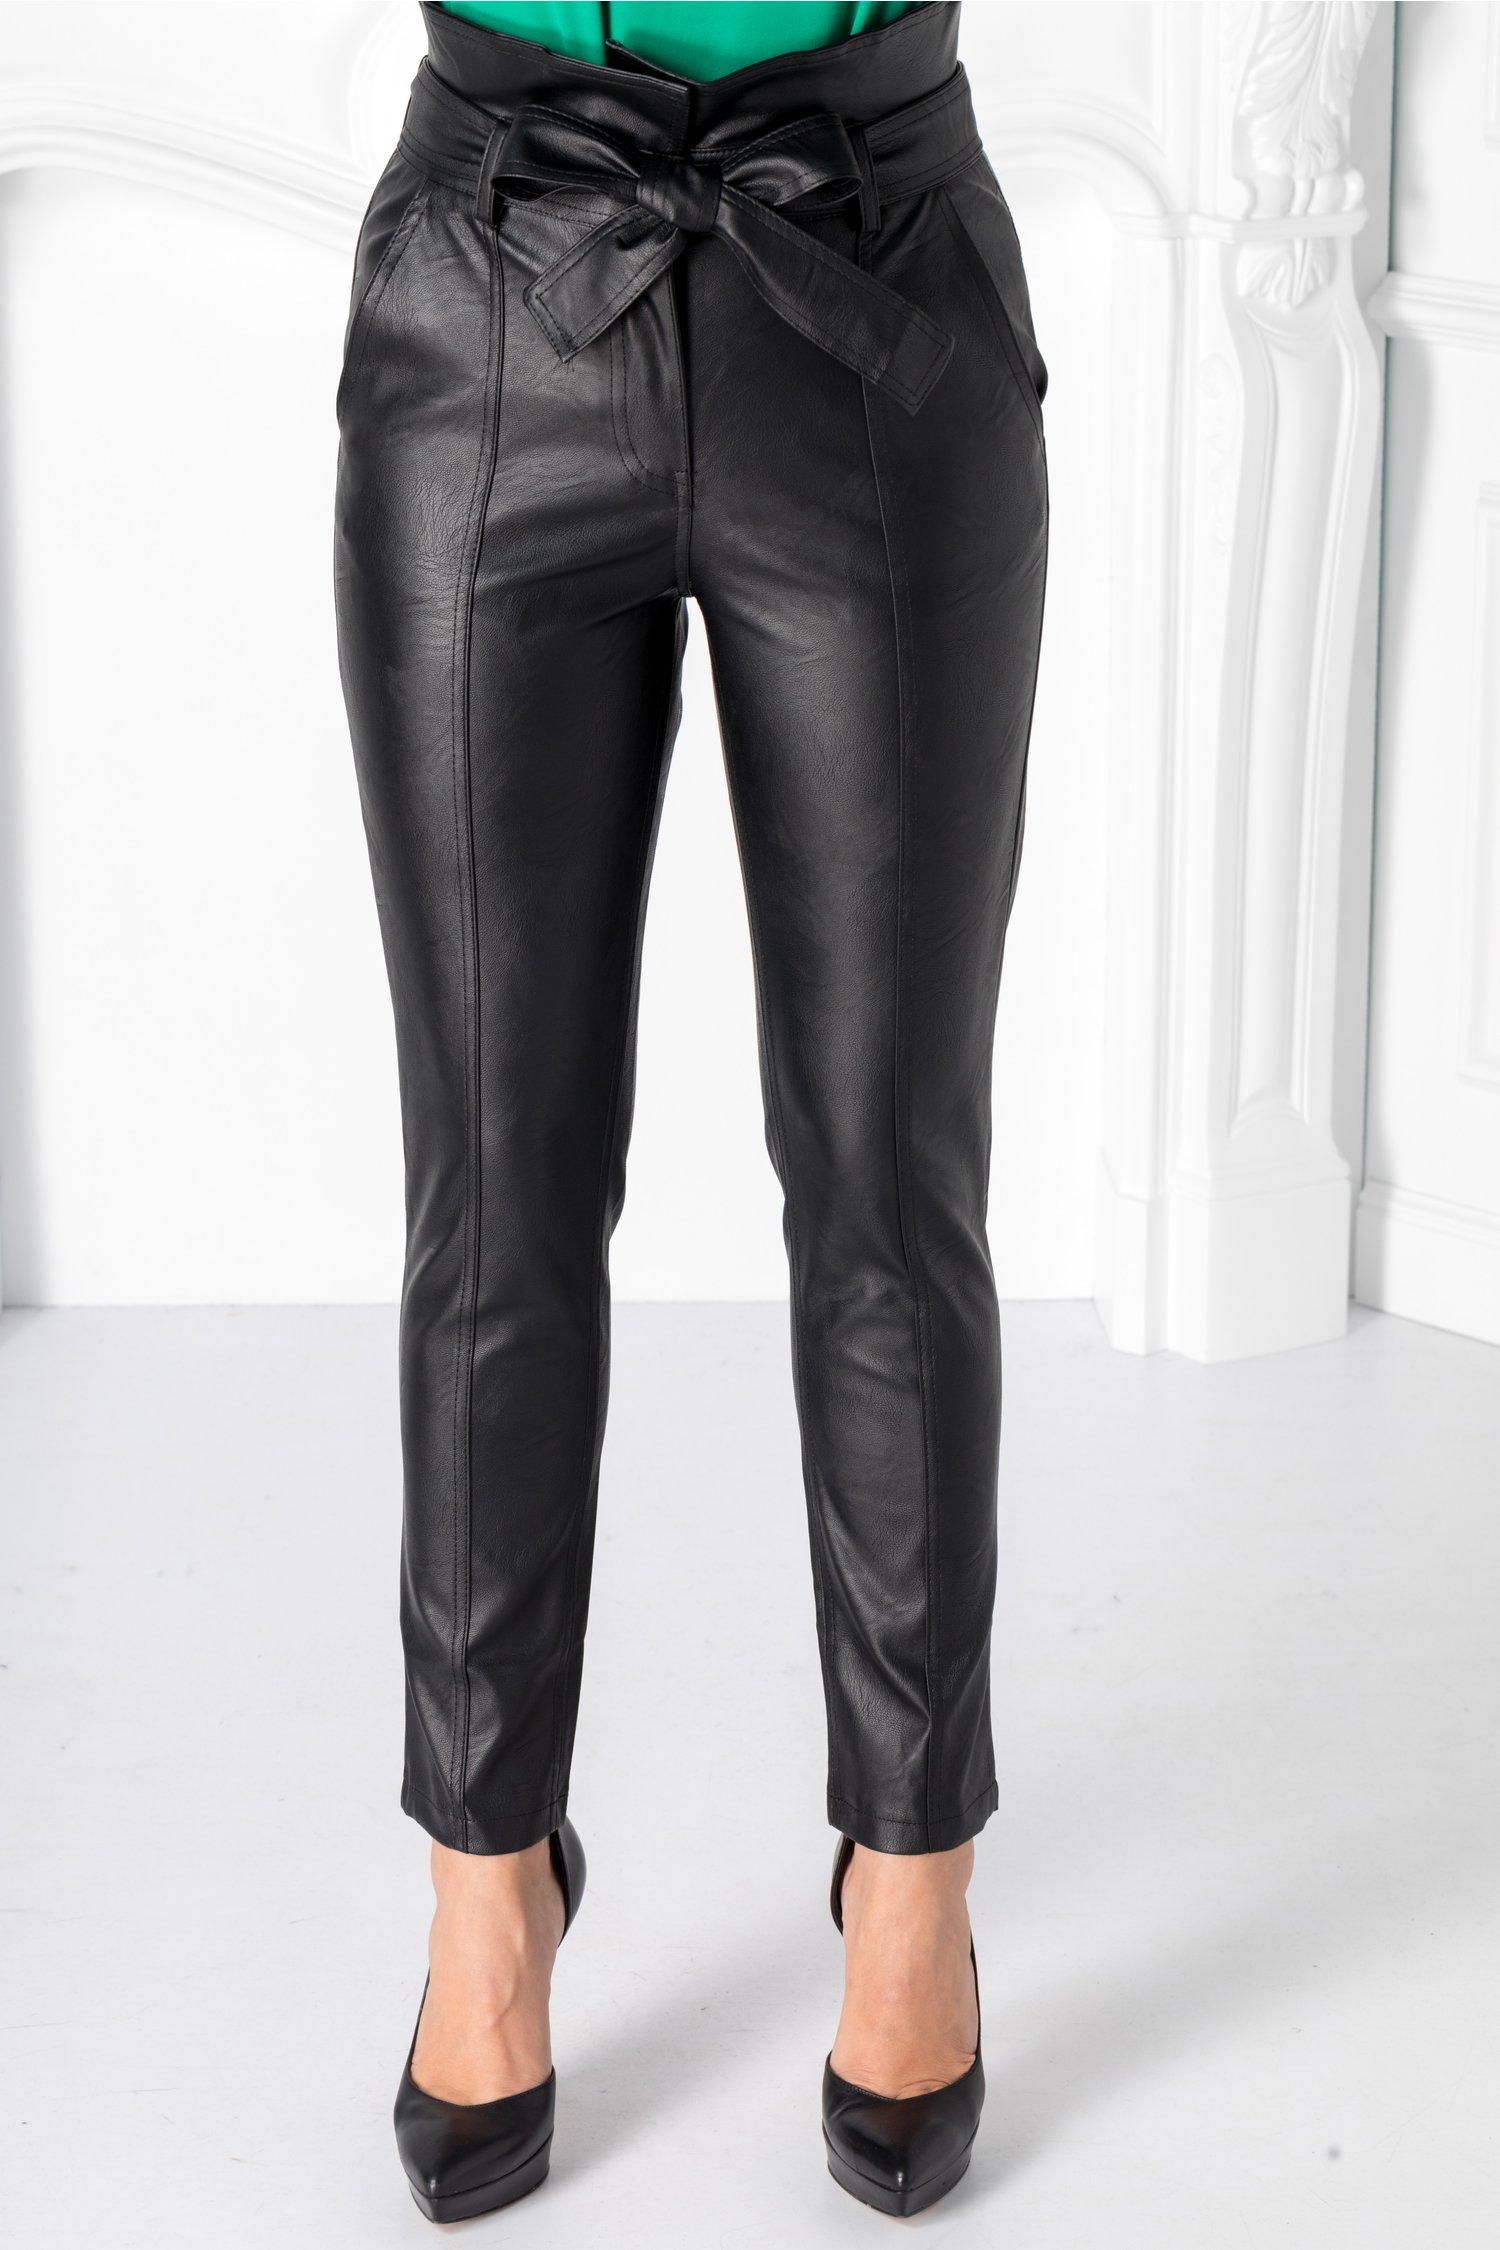 pantaloni dama ieftini